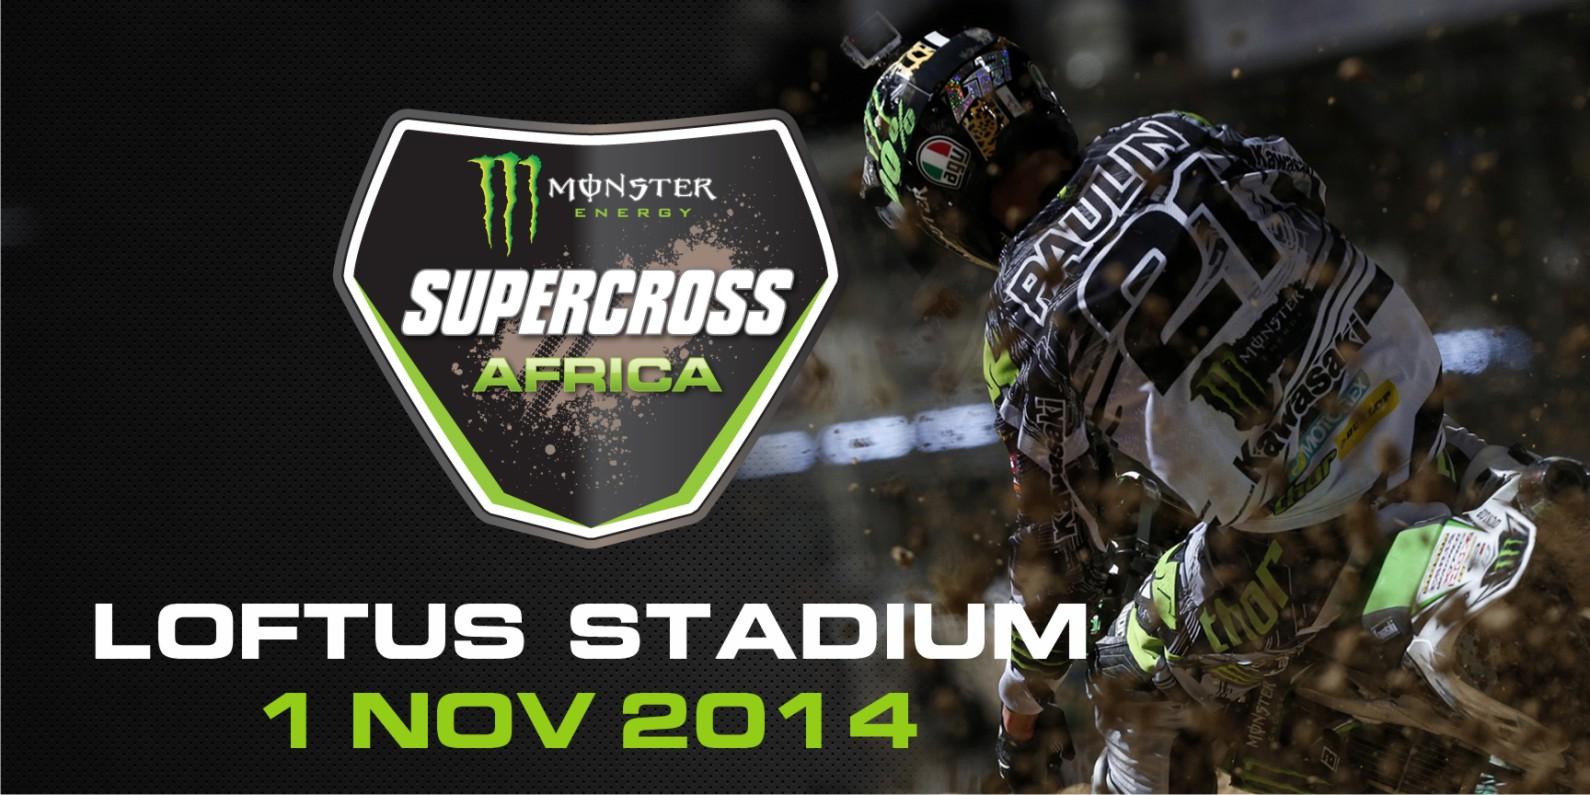 Monster Energy Supercross Africa is coming to Loftus Versfeld